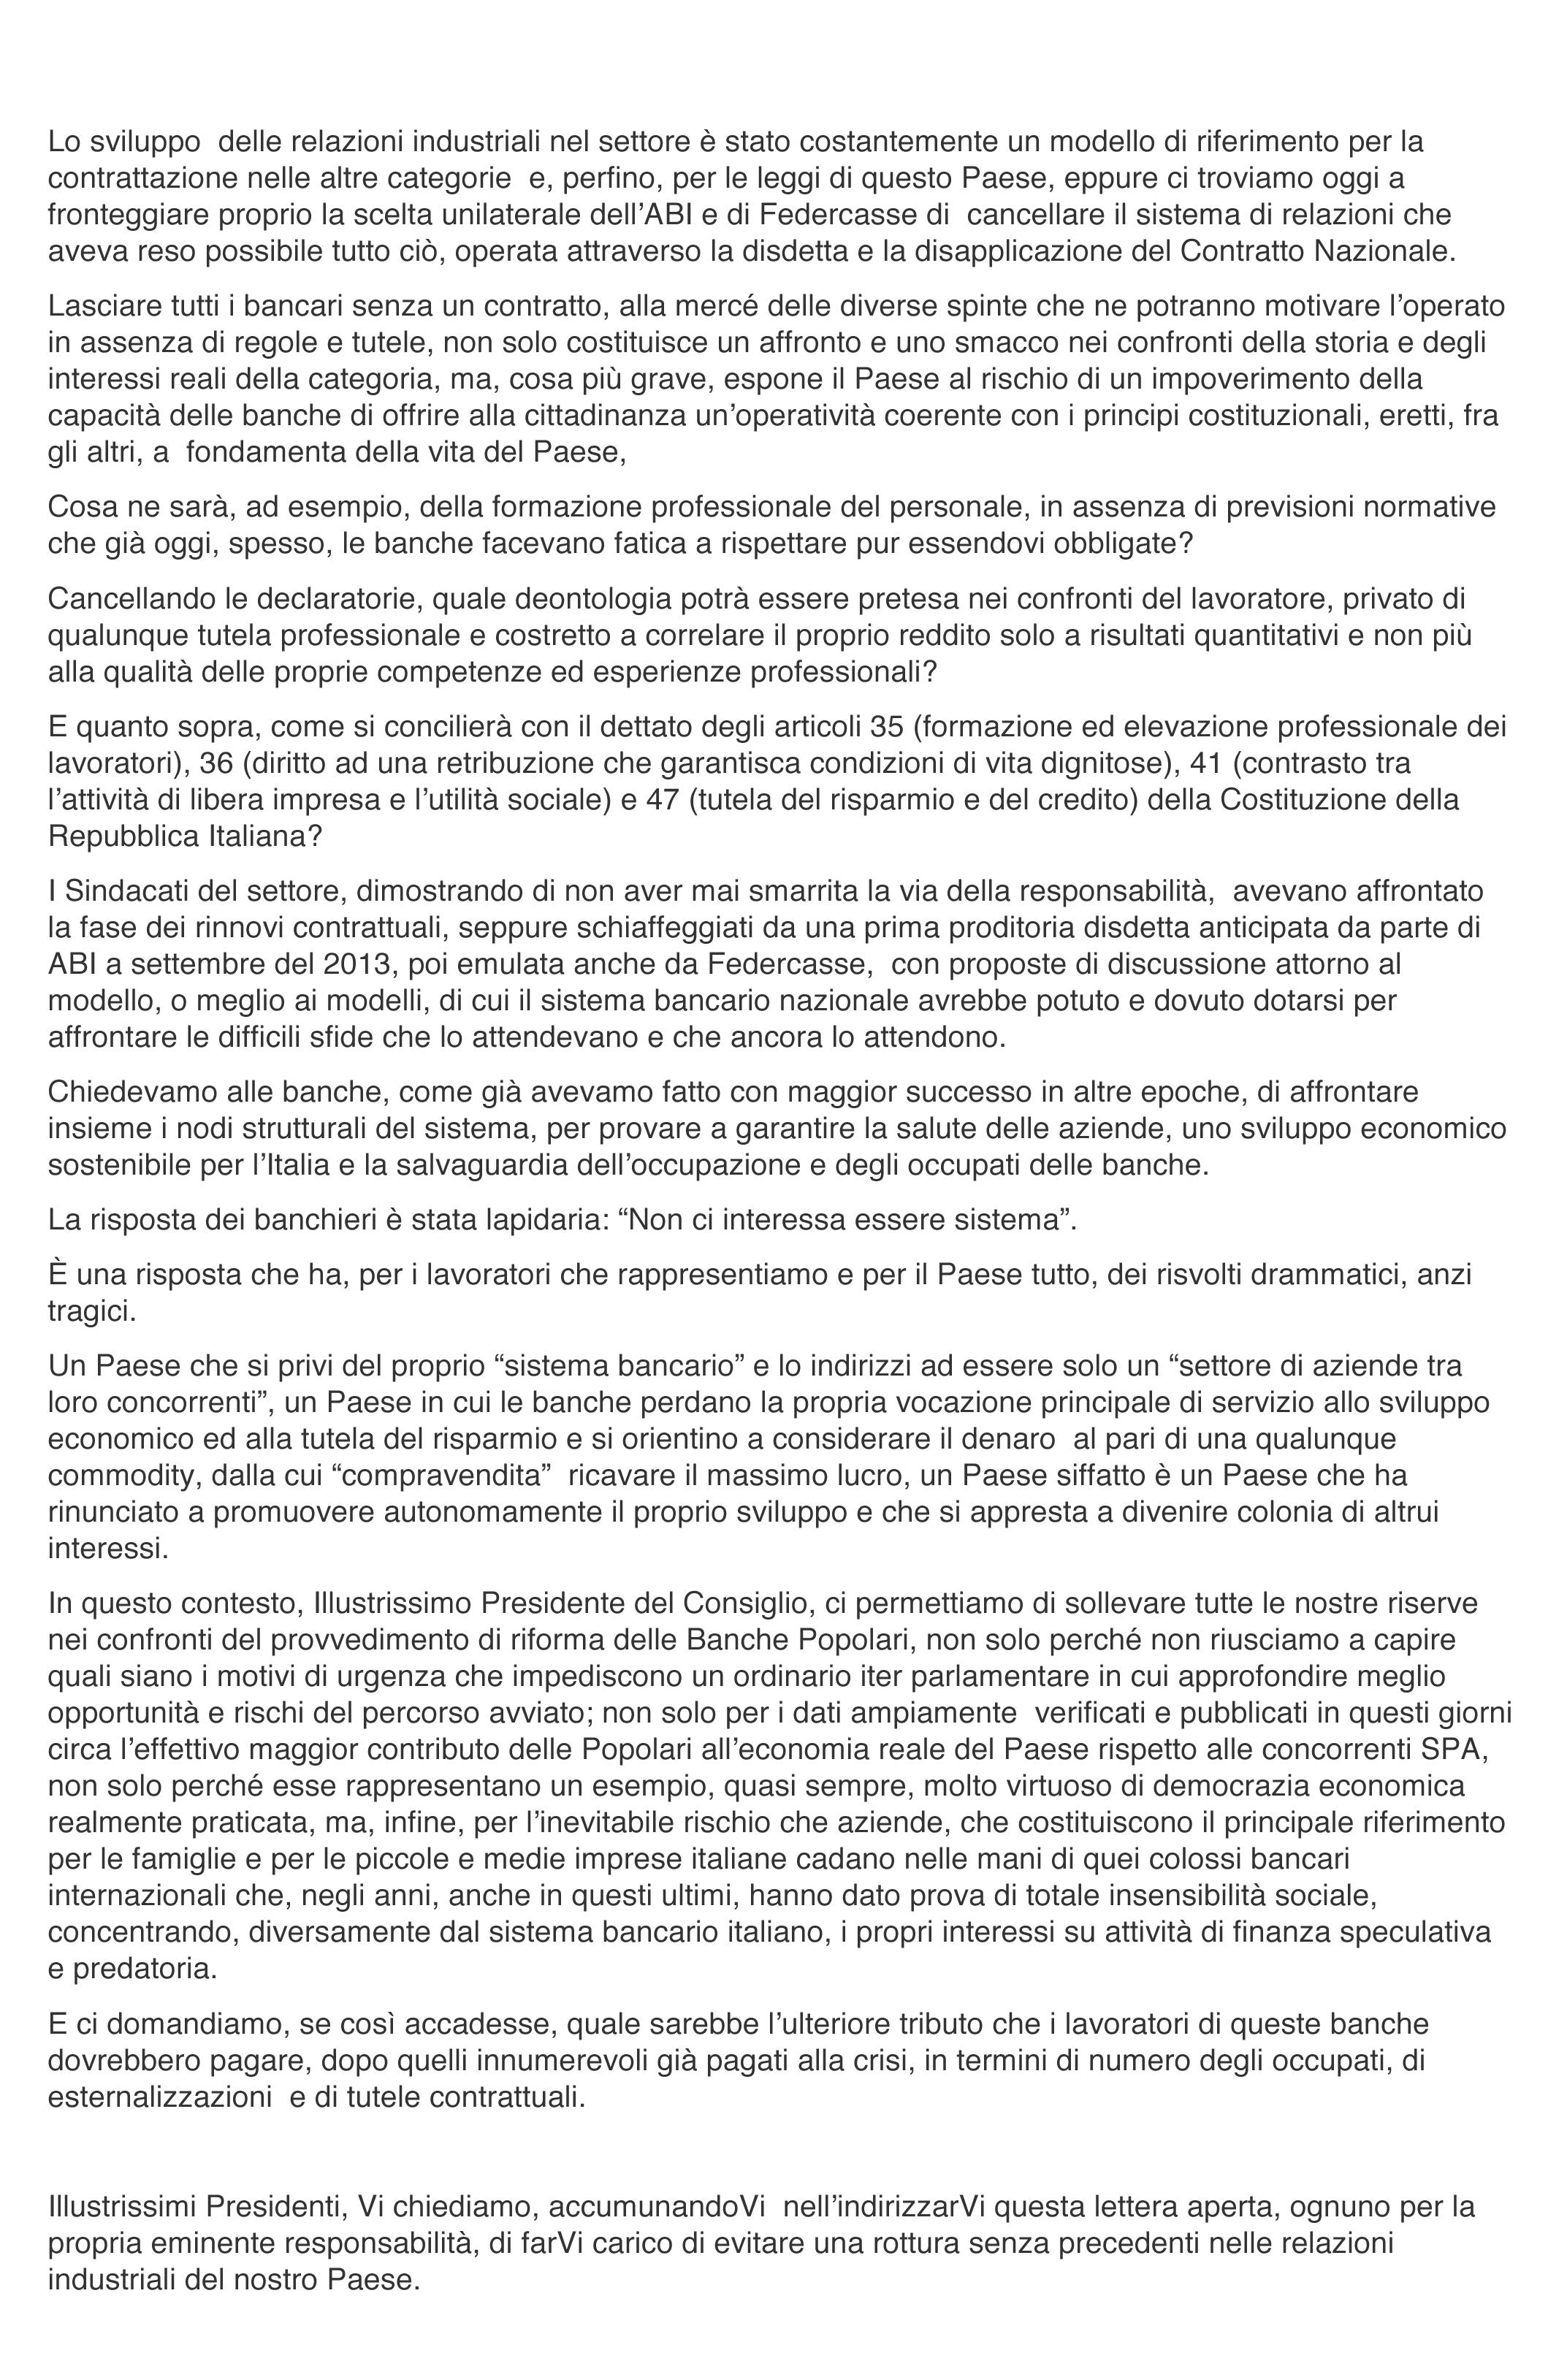 Microsoft Word - lettera a Renzi, Patuelli e Azzi 2.doc